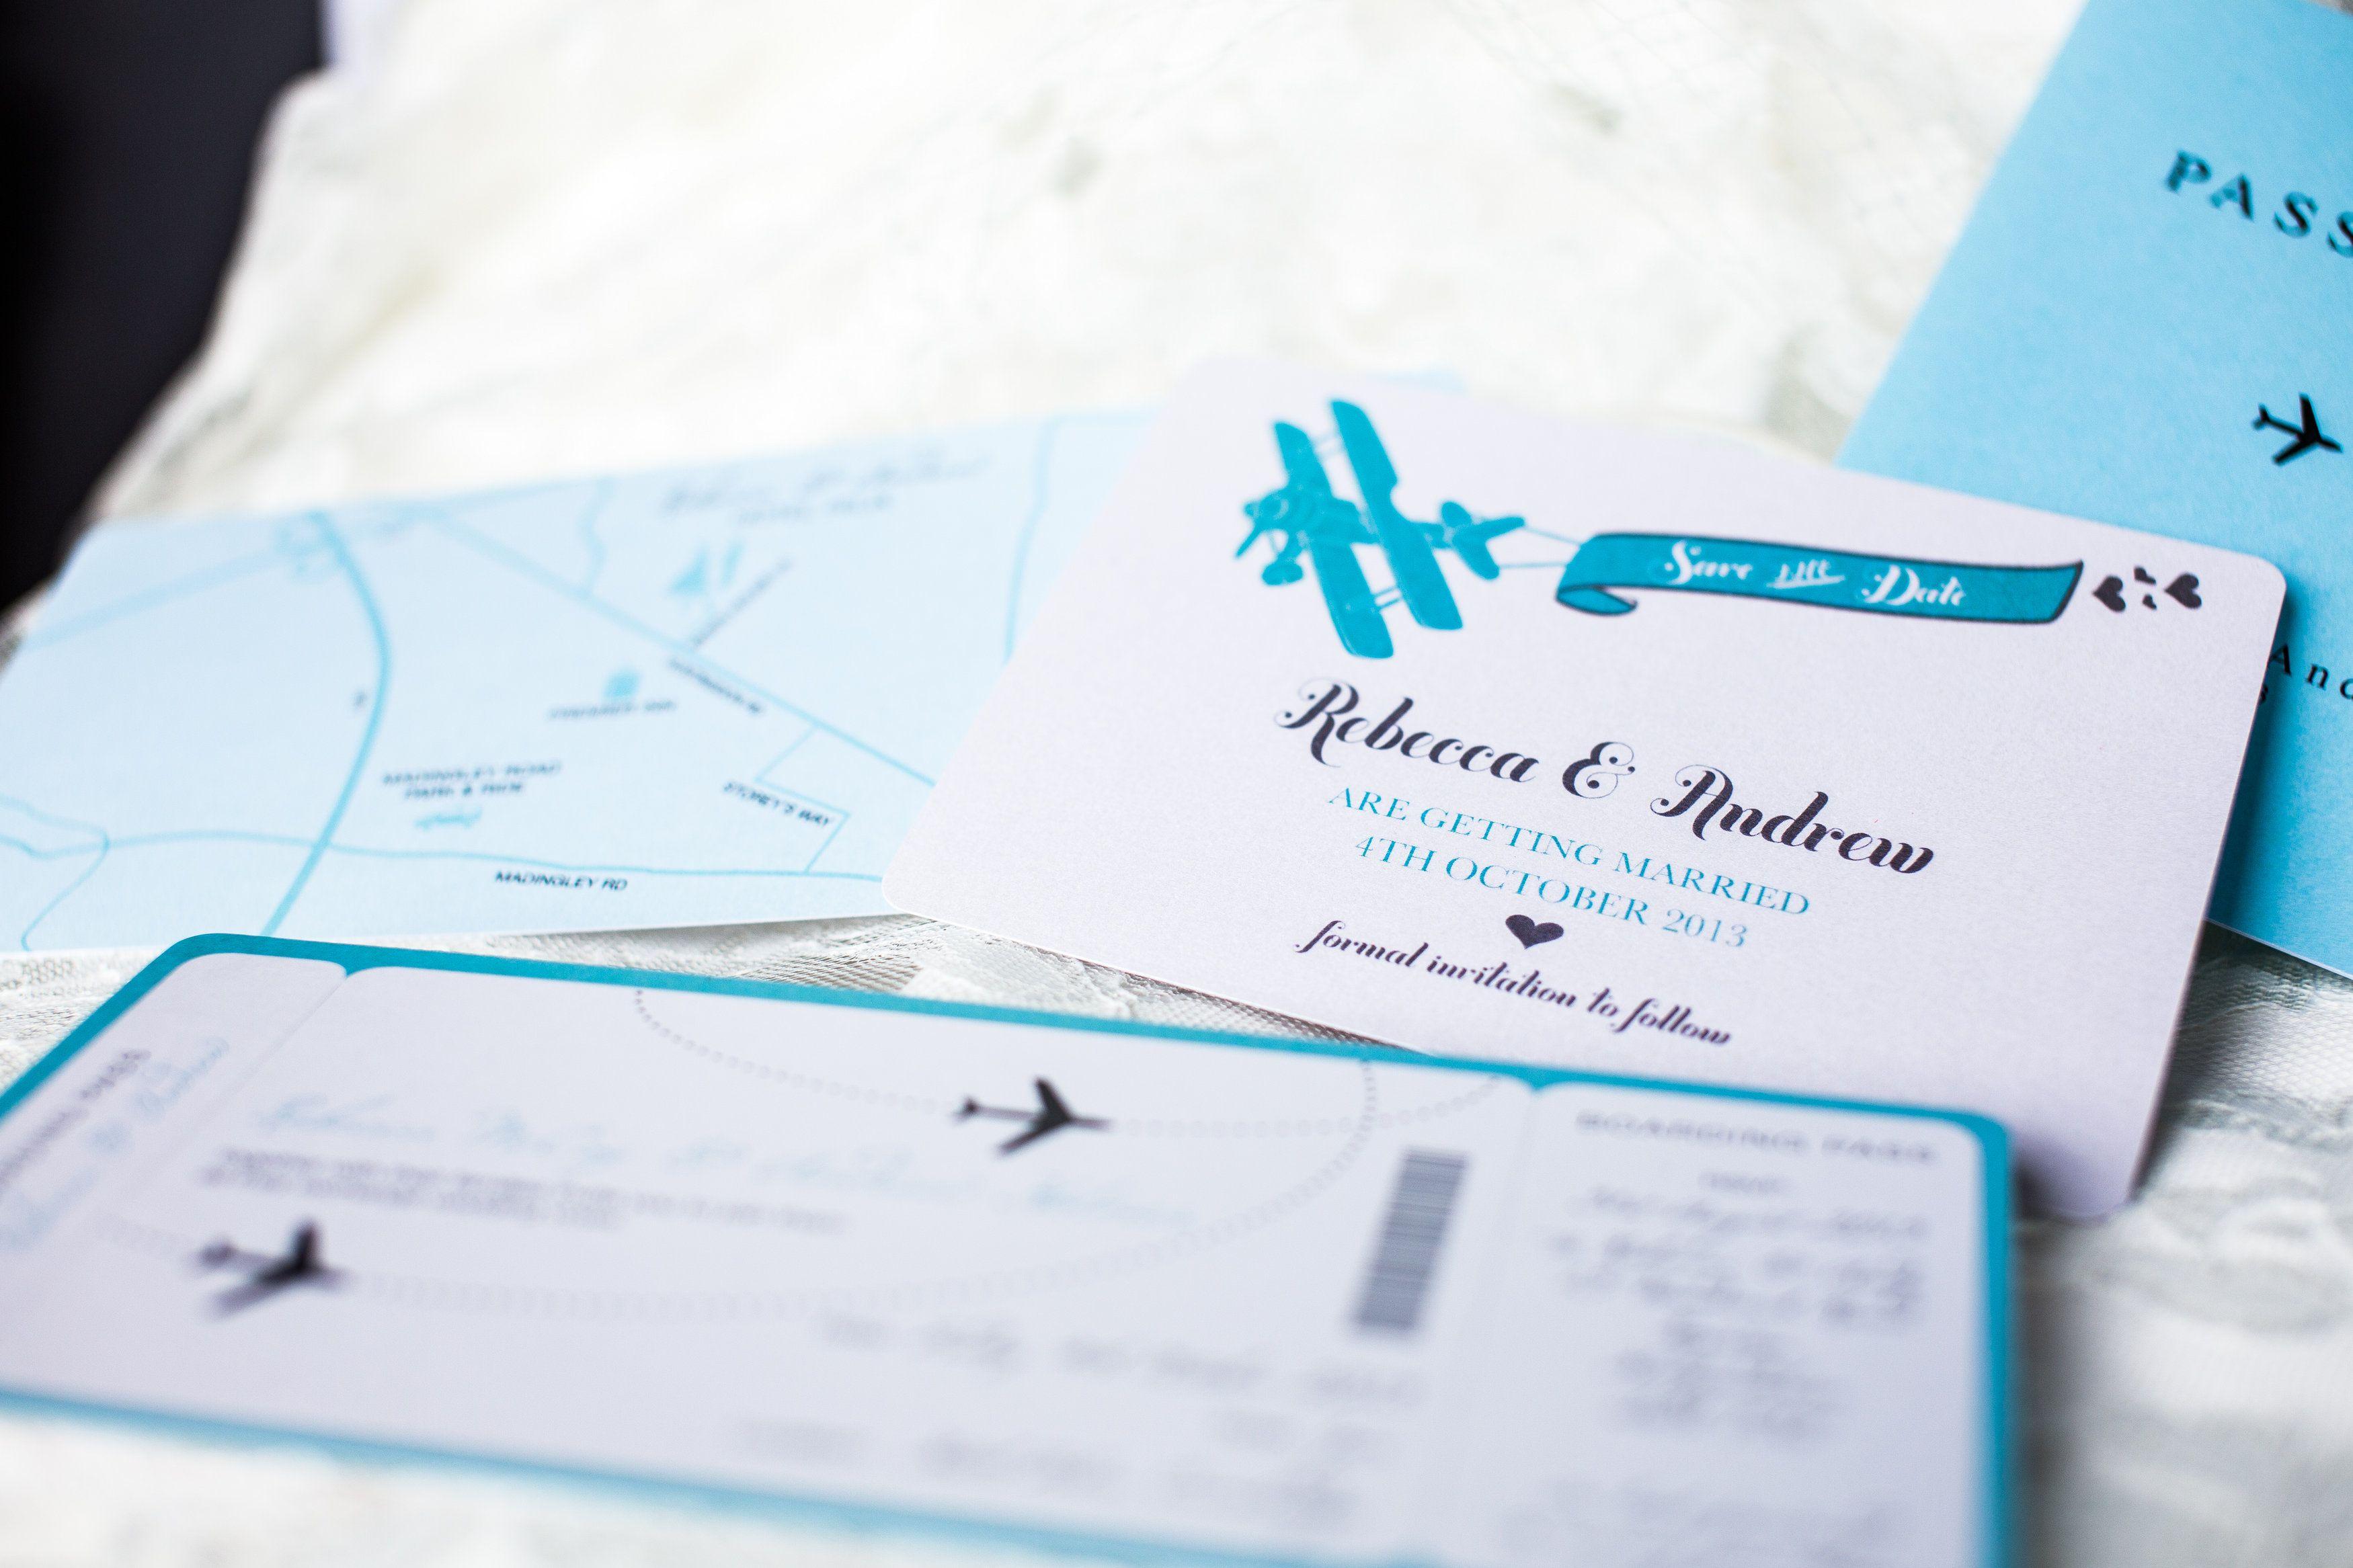 Travel themed wedding invitations and stationery www.samandlouise.co ...